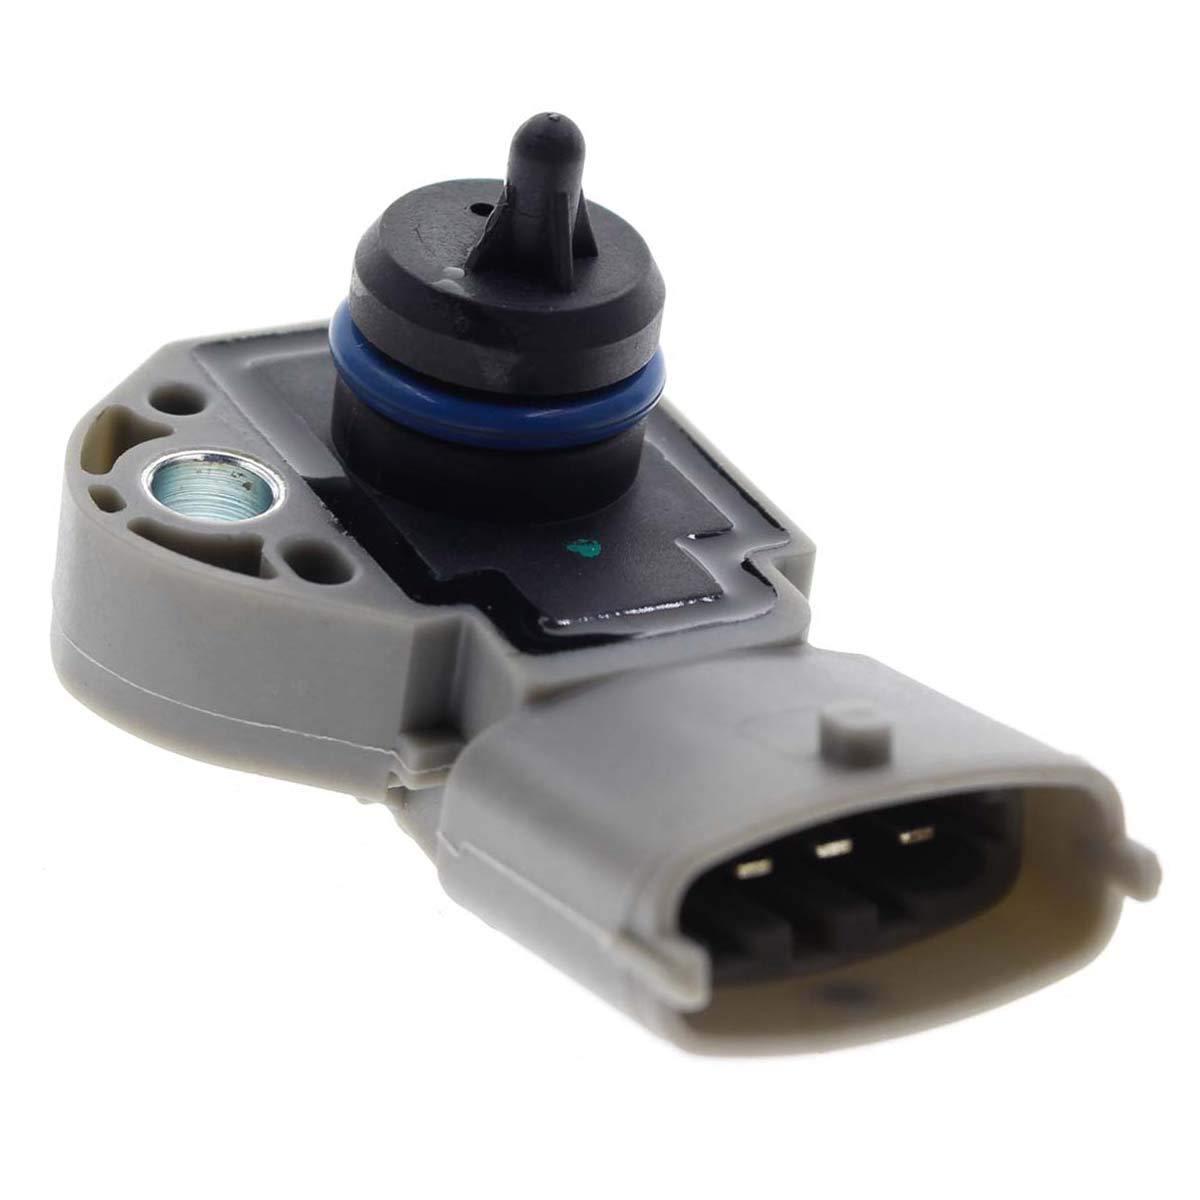 AUTOKAY Fuel Pressure Sensor 0261230238 for Volvo XC60 XC70 XC90 V50 V60 V70 S40 S60 S80 C30 C70 0261230238 Land Rover LR2